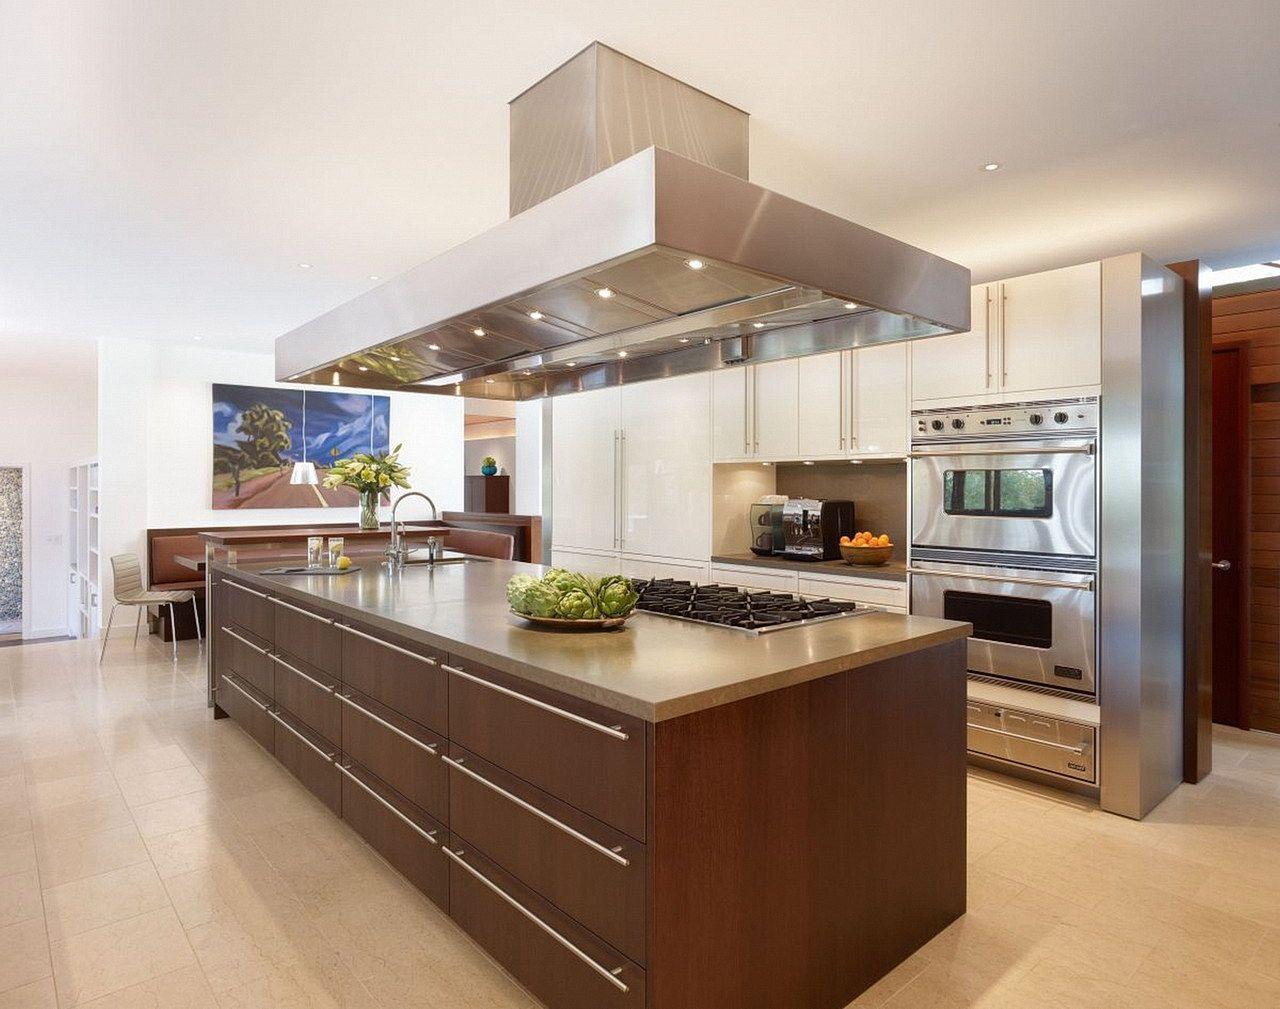 Insel Küche Nantucket Moderne keukens, Modern kookeiland